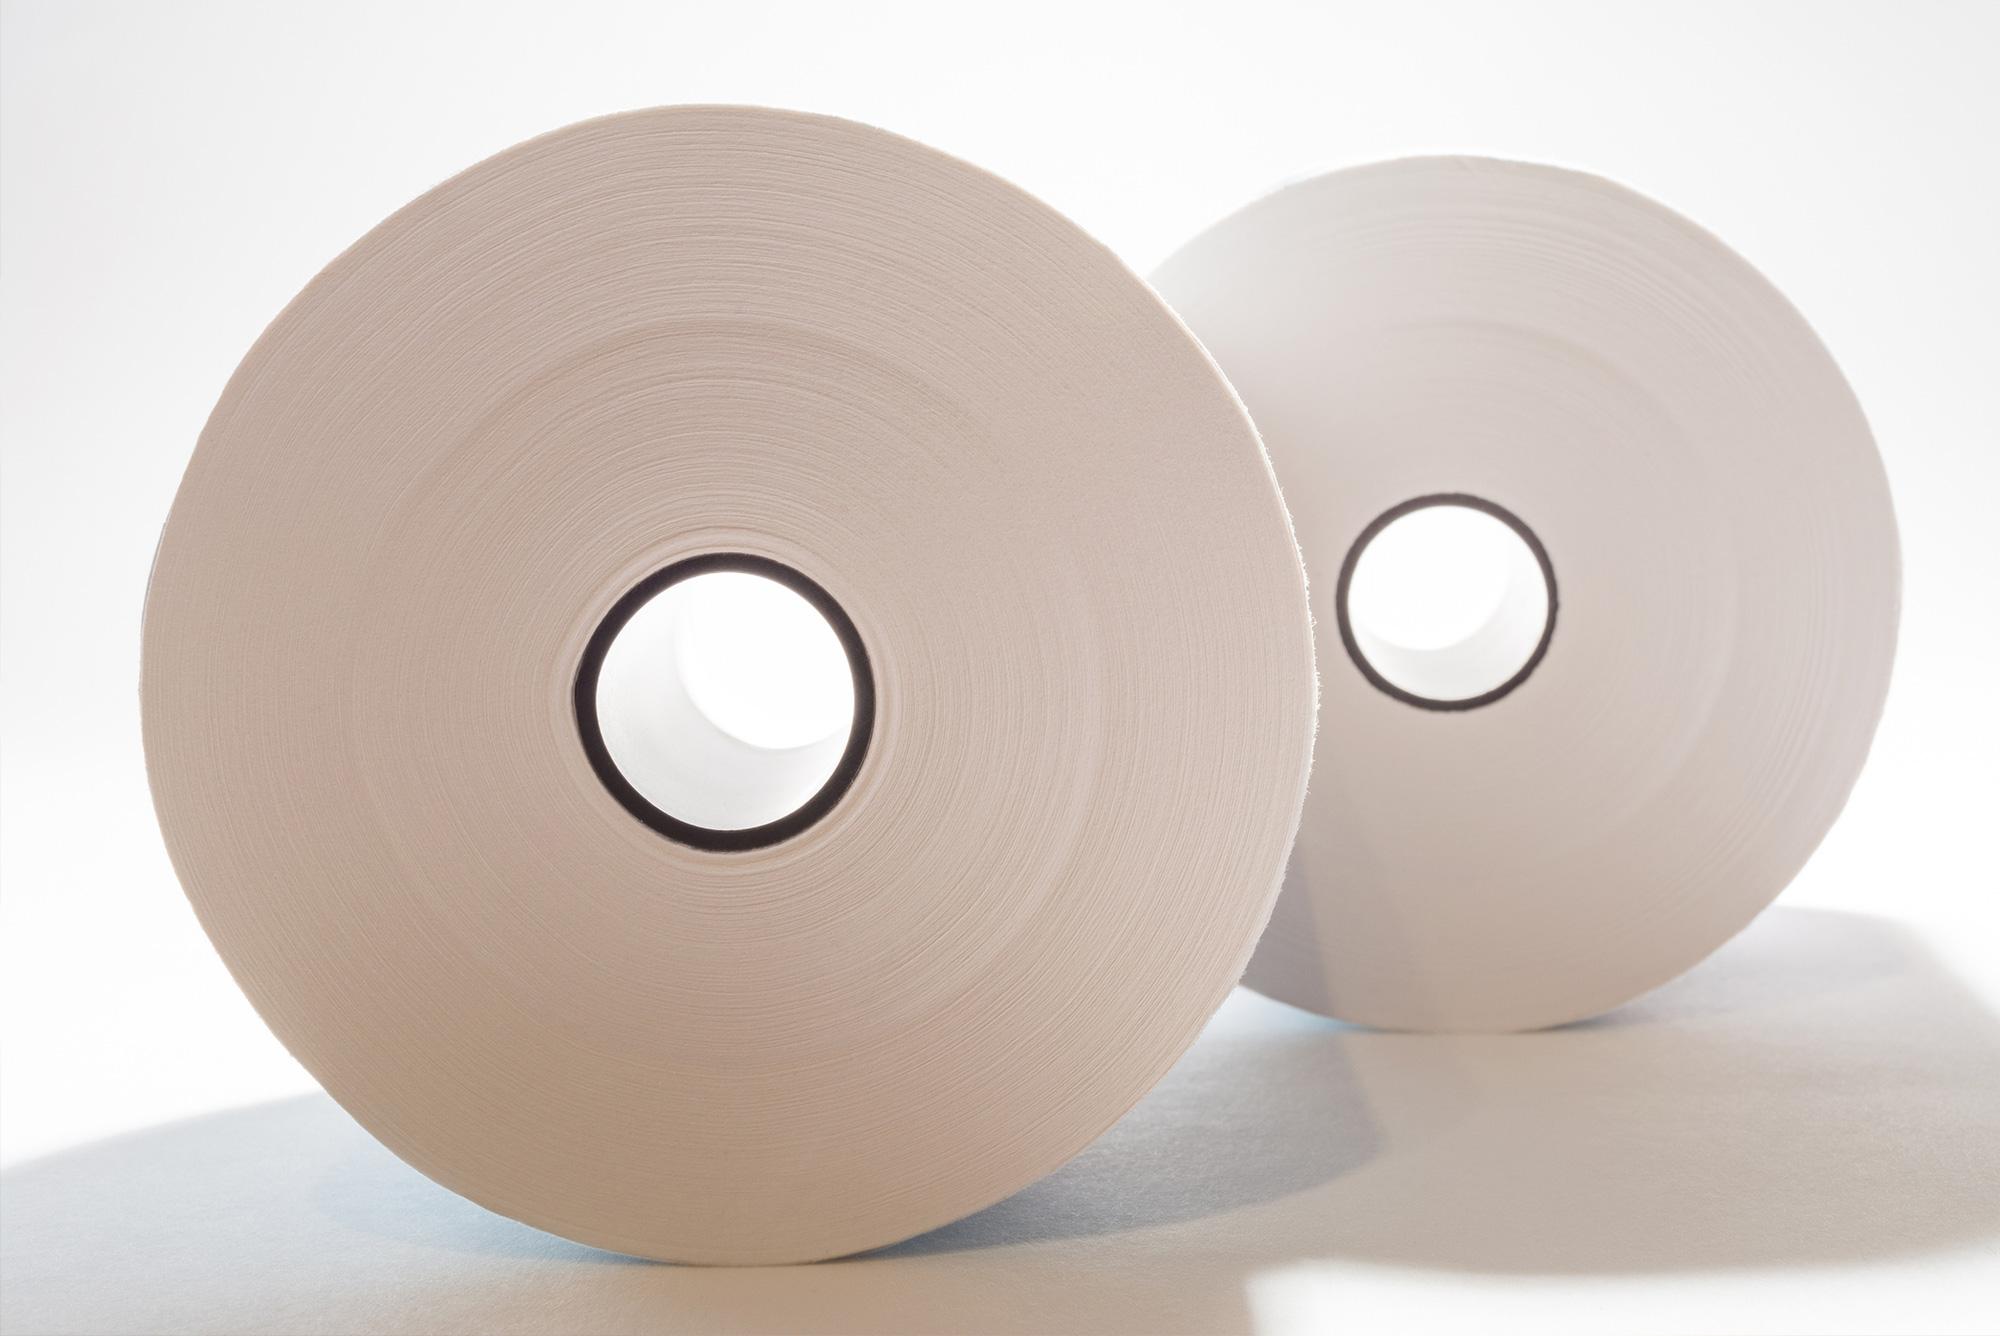 Multiple paper rolls